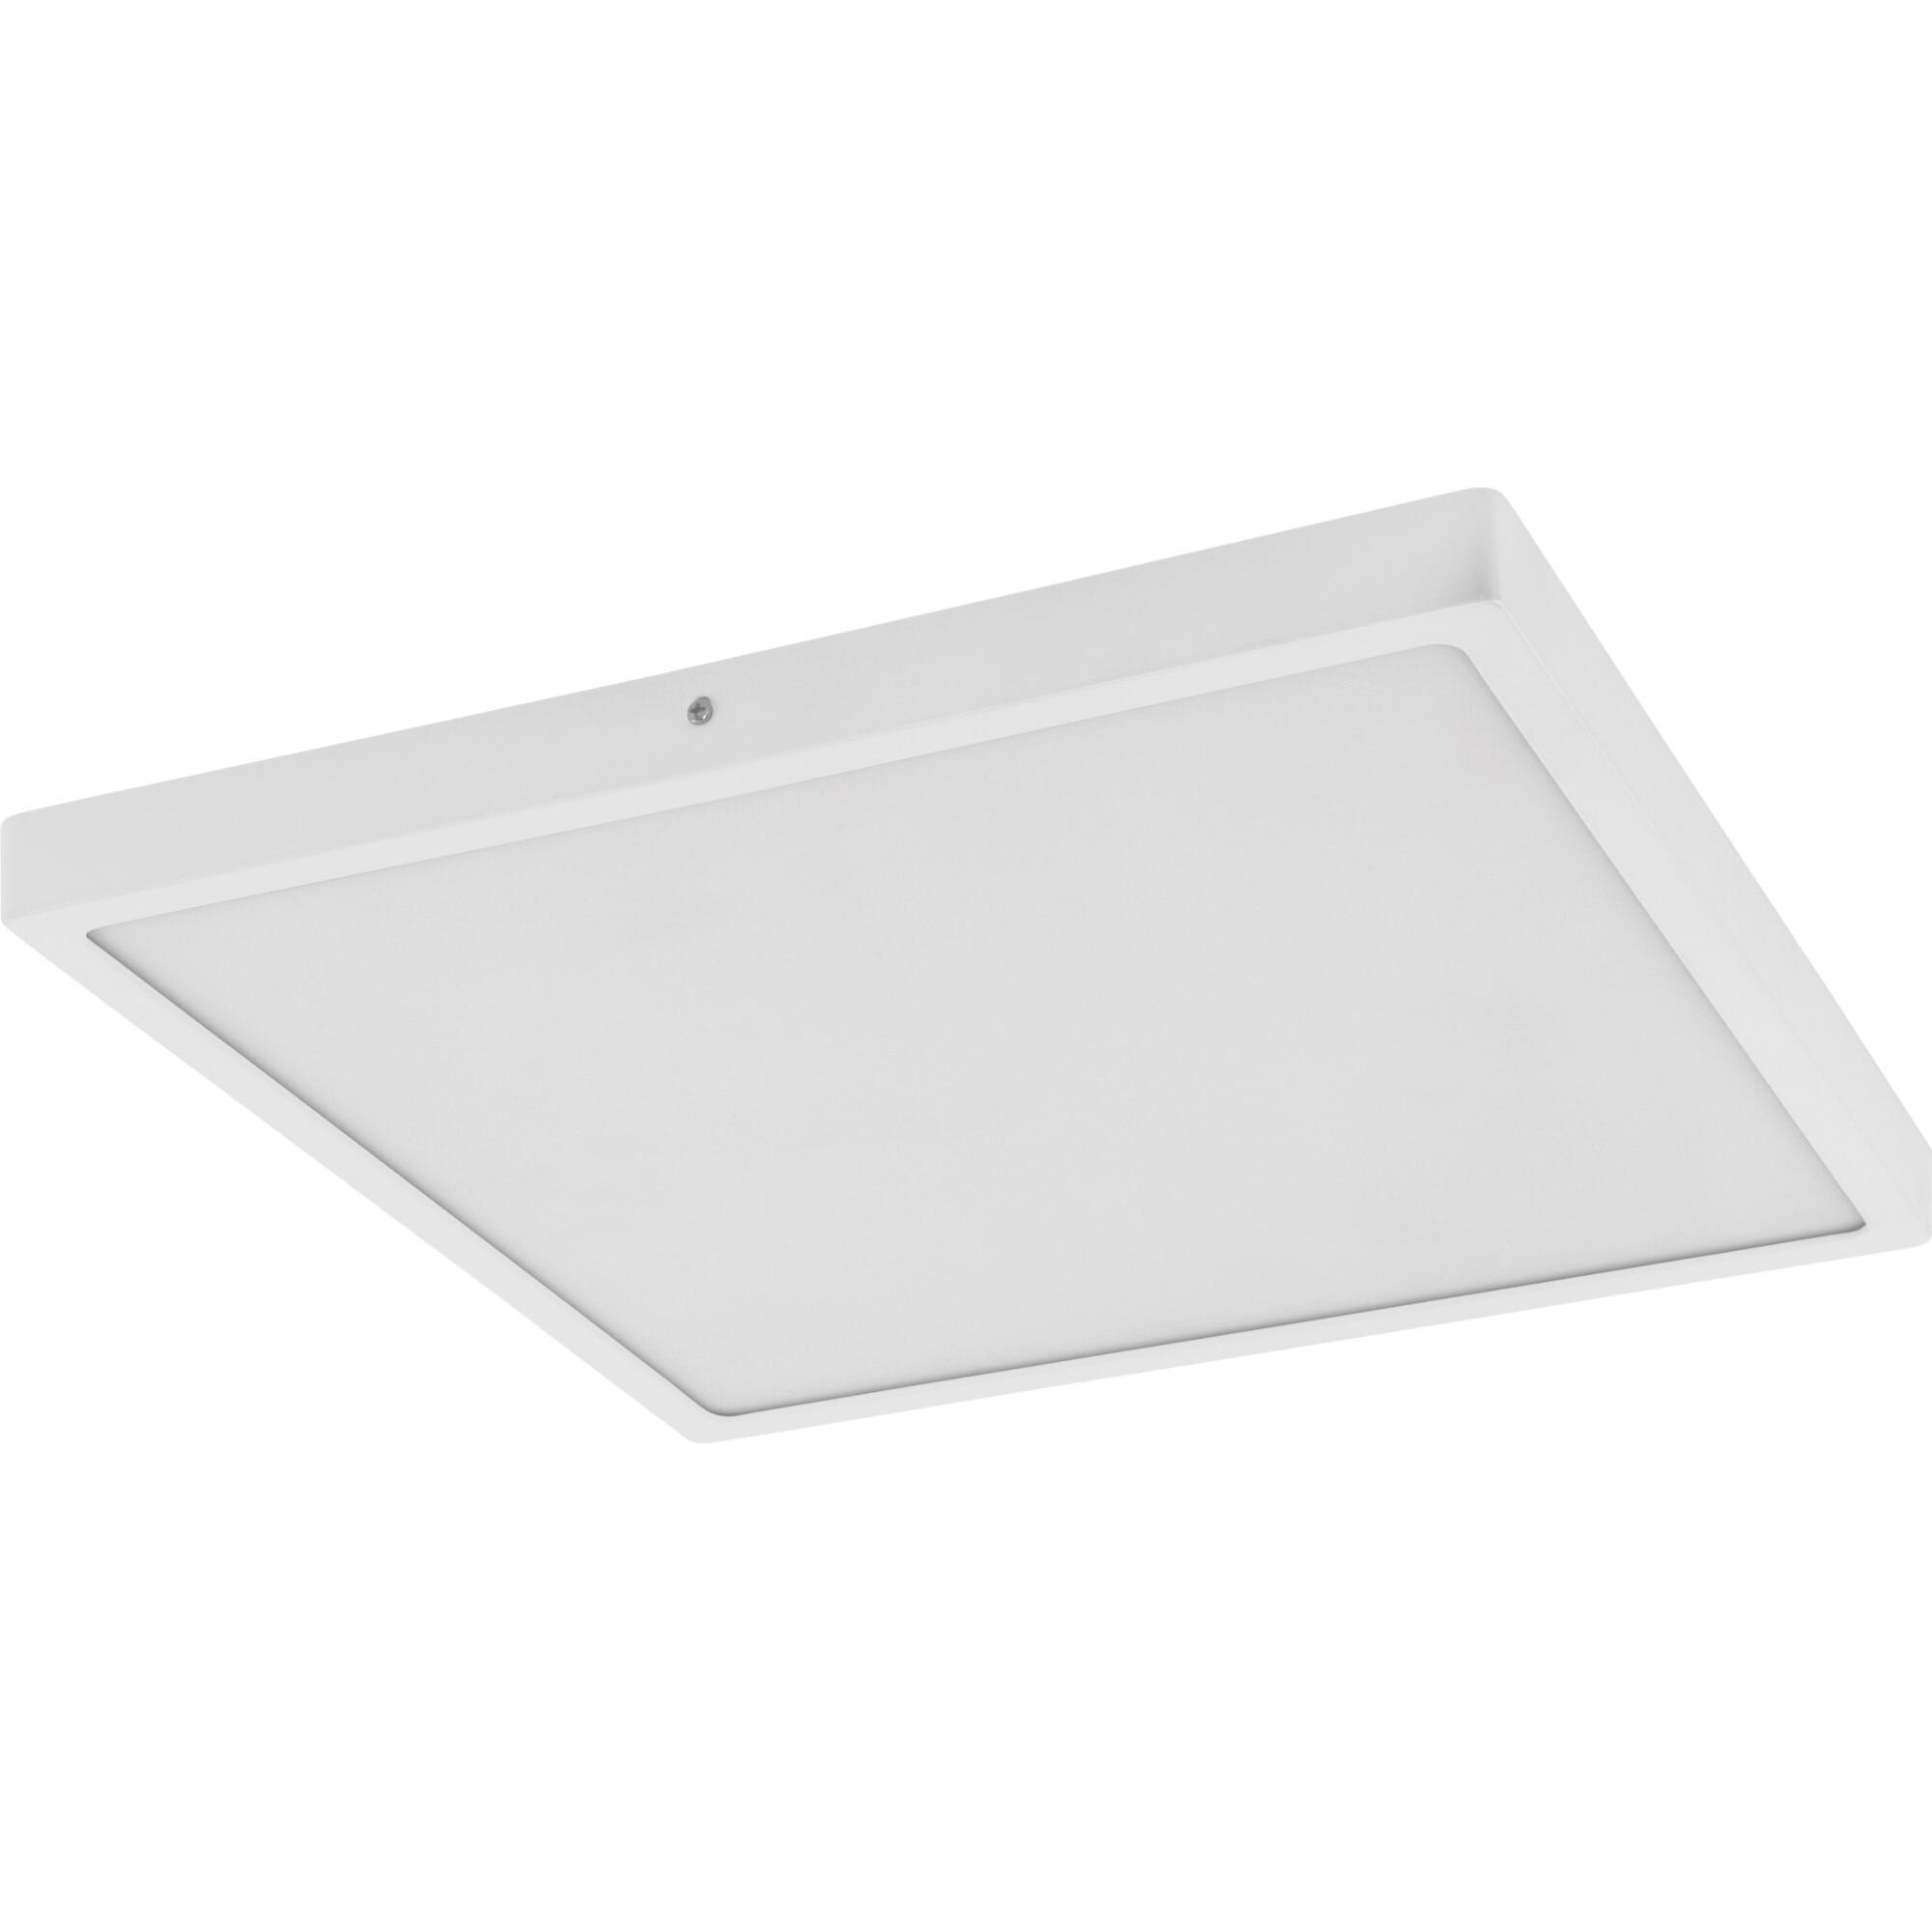 Fotografie Plafoniera LED integrat Eglo Fueva 1 97268, 25W, 2500 lm, A++, lumina neutra (4000K), 40x40 cm, Aluminiu, Alb